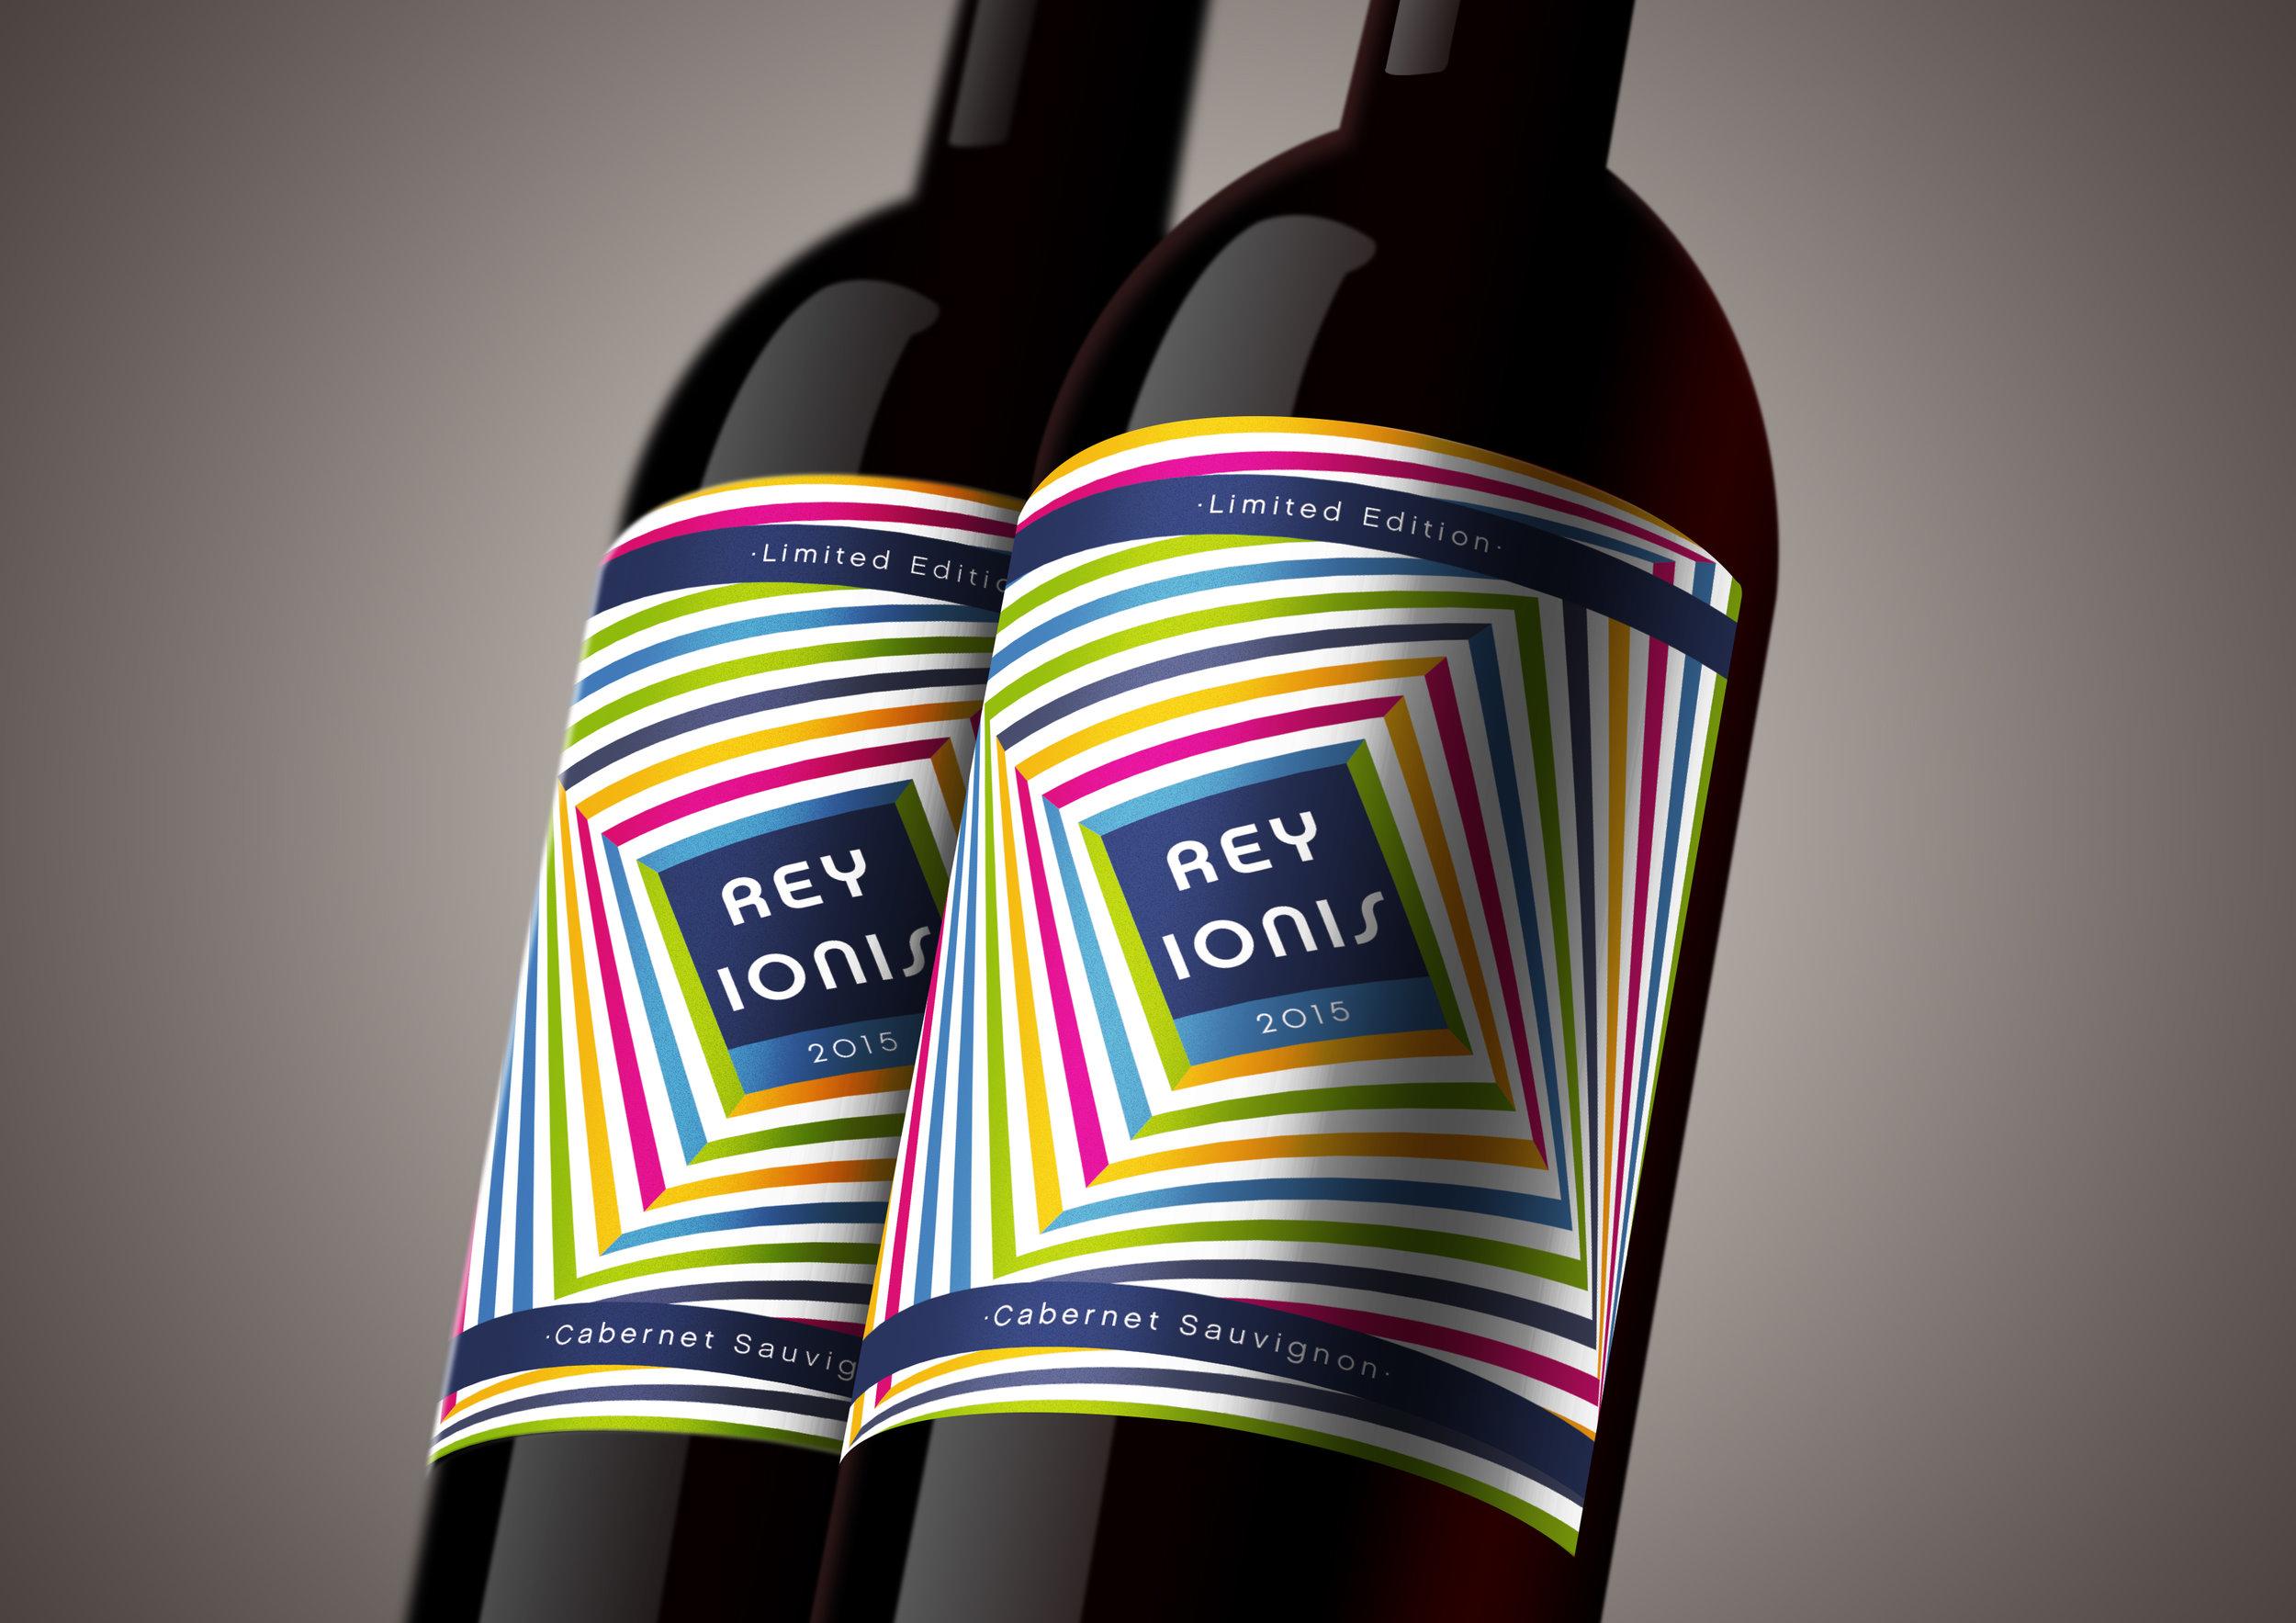 Rey Ionis 2 bottle shot.jpg